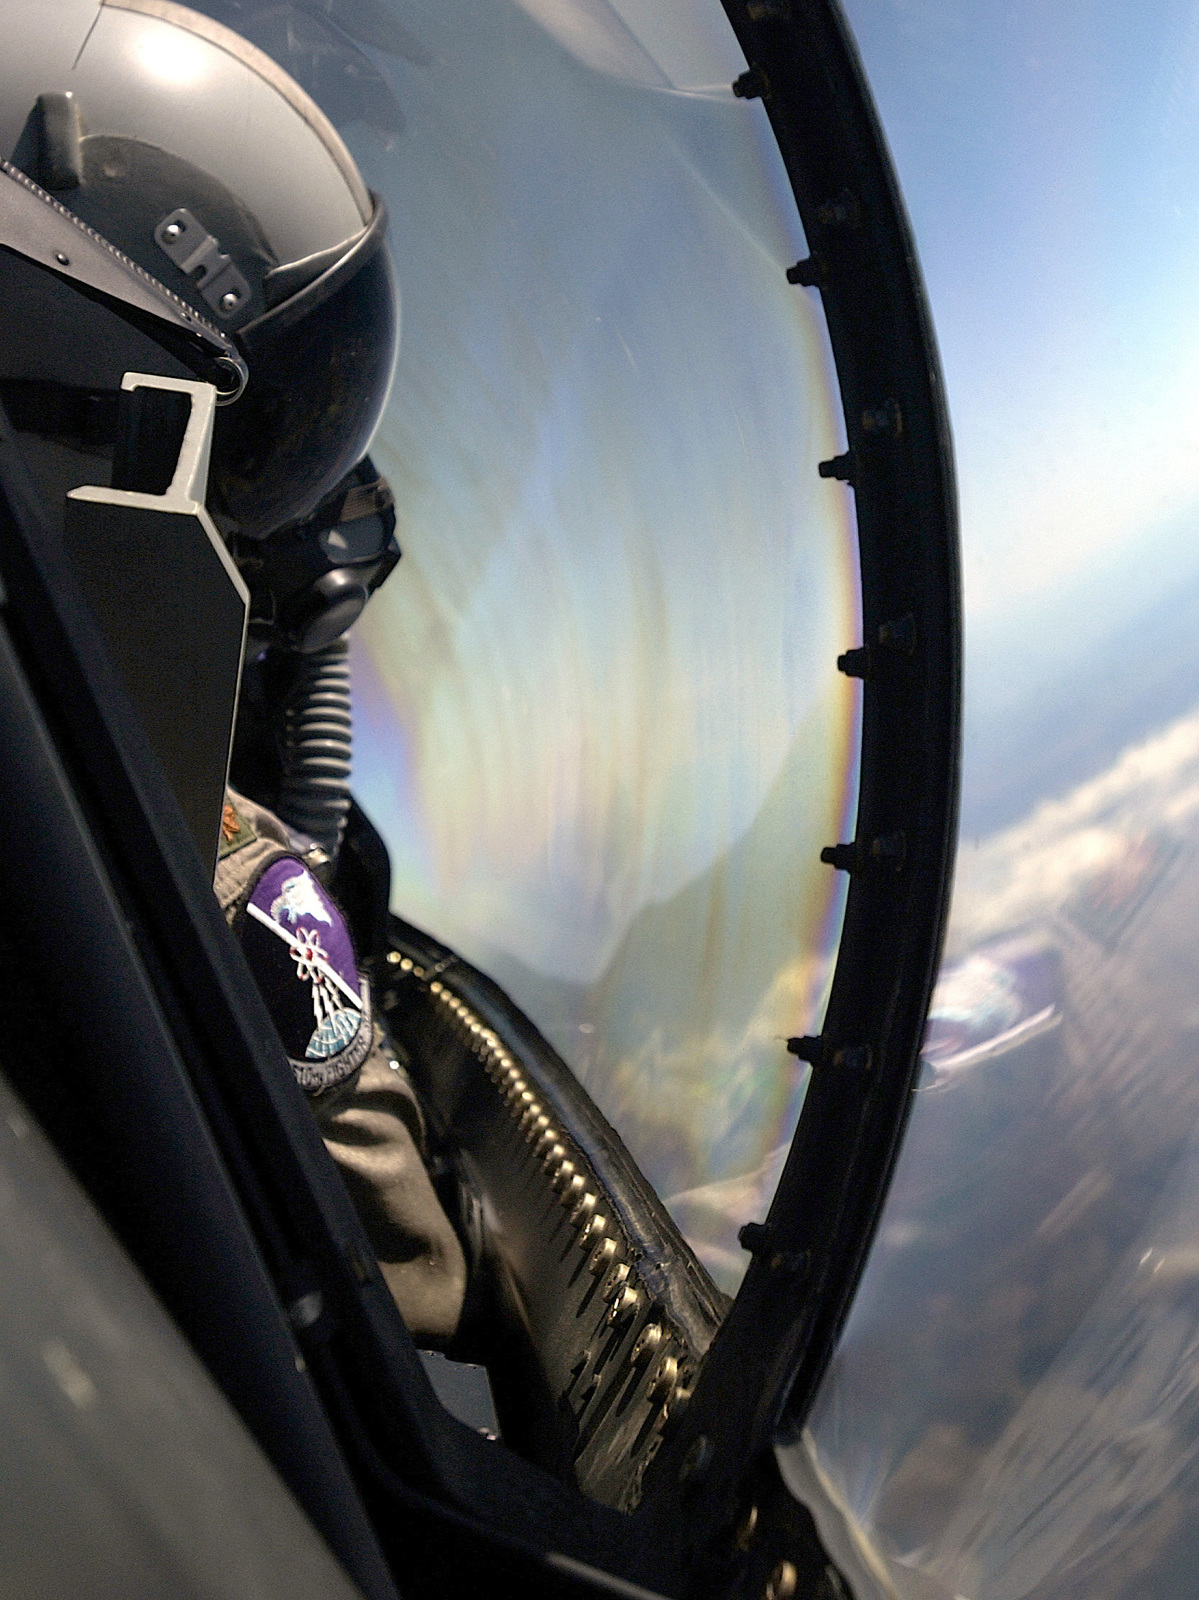 Pilots point of view as US Air Force (USAF) Major (MAJ) Brett